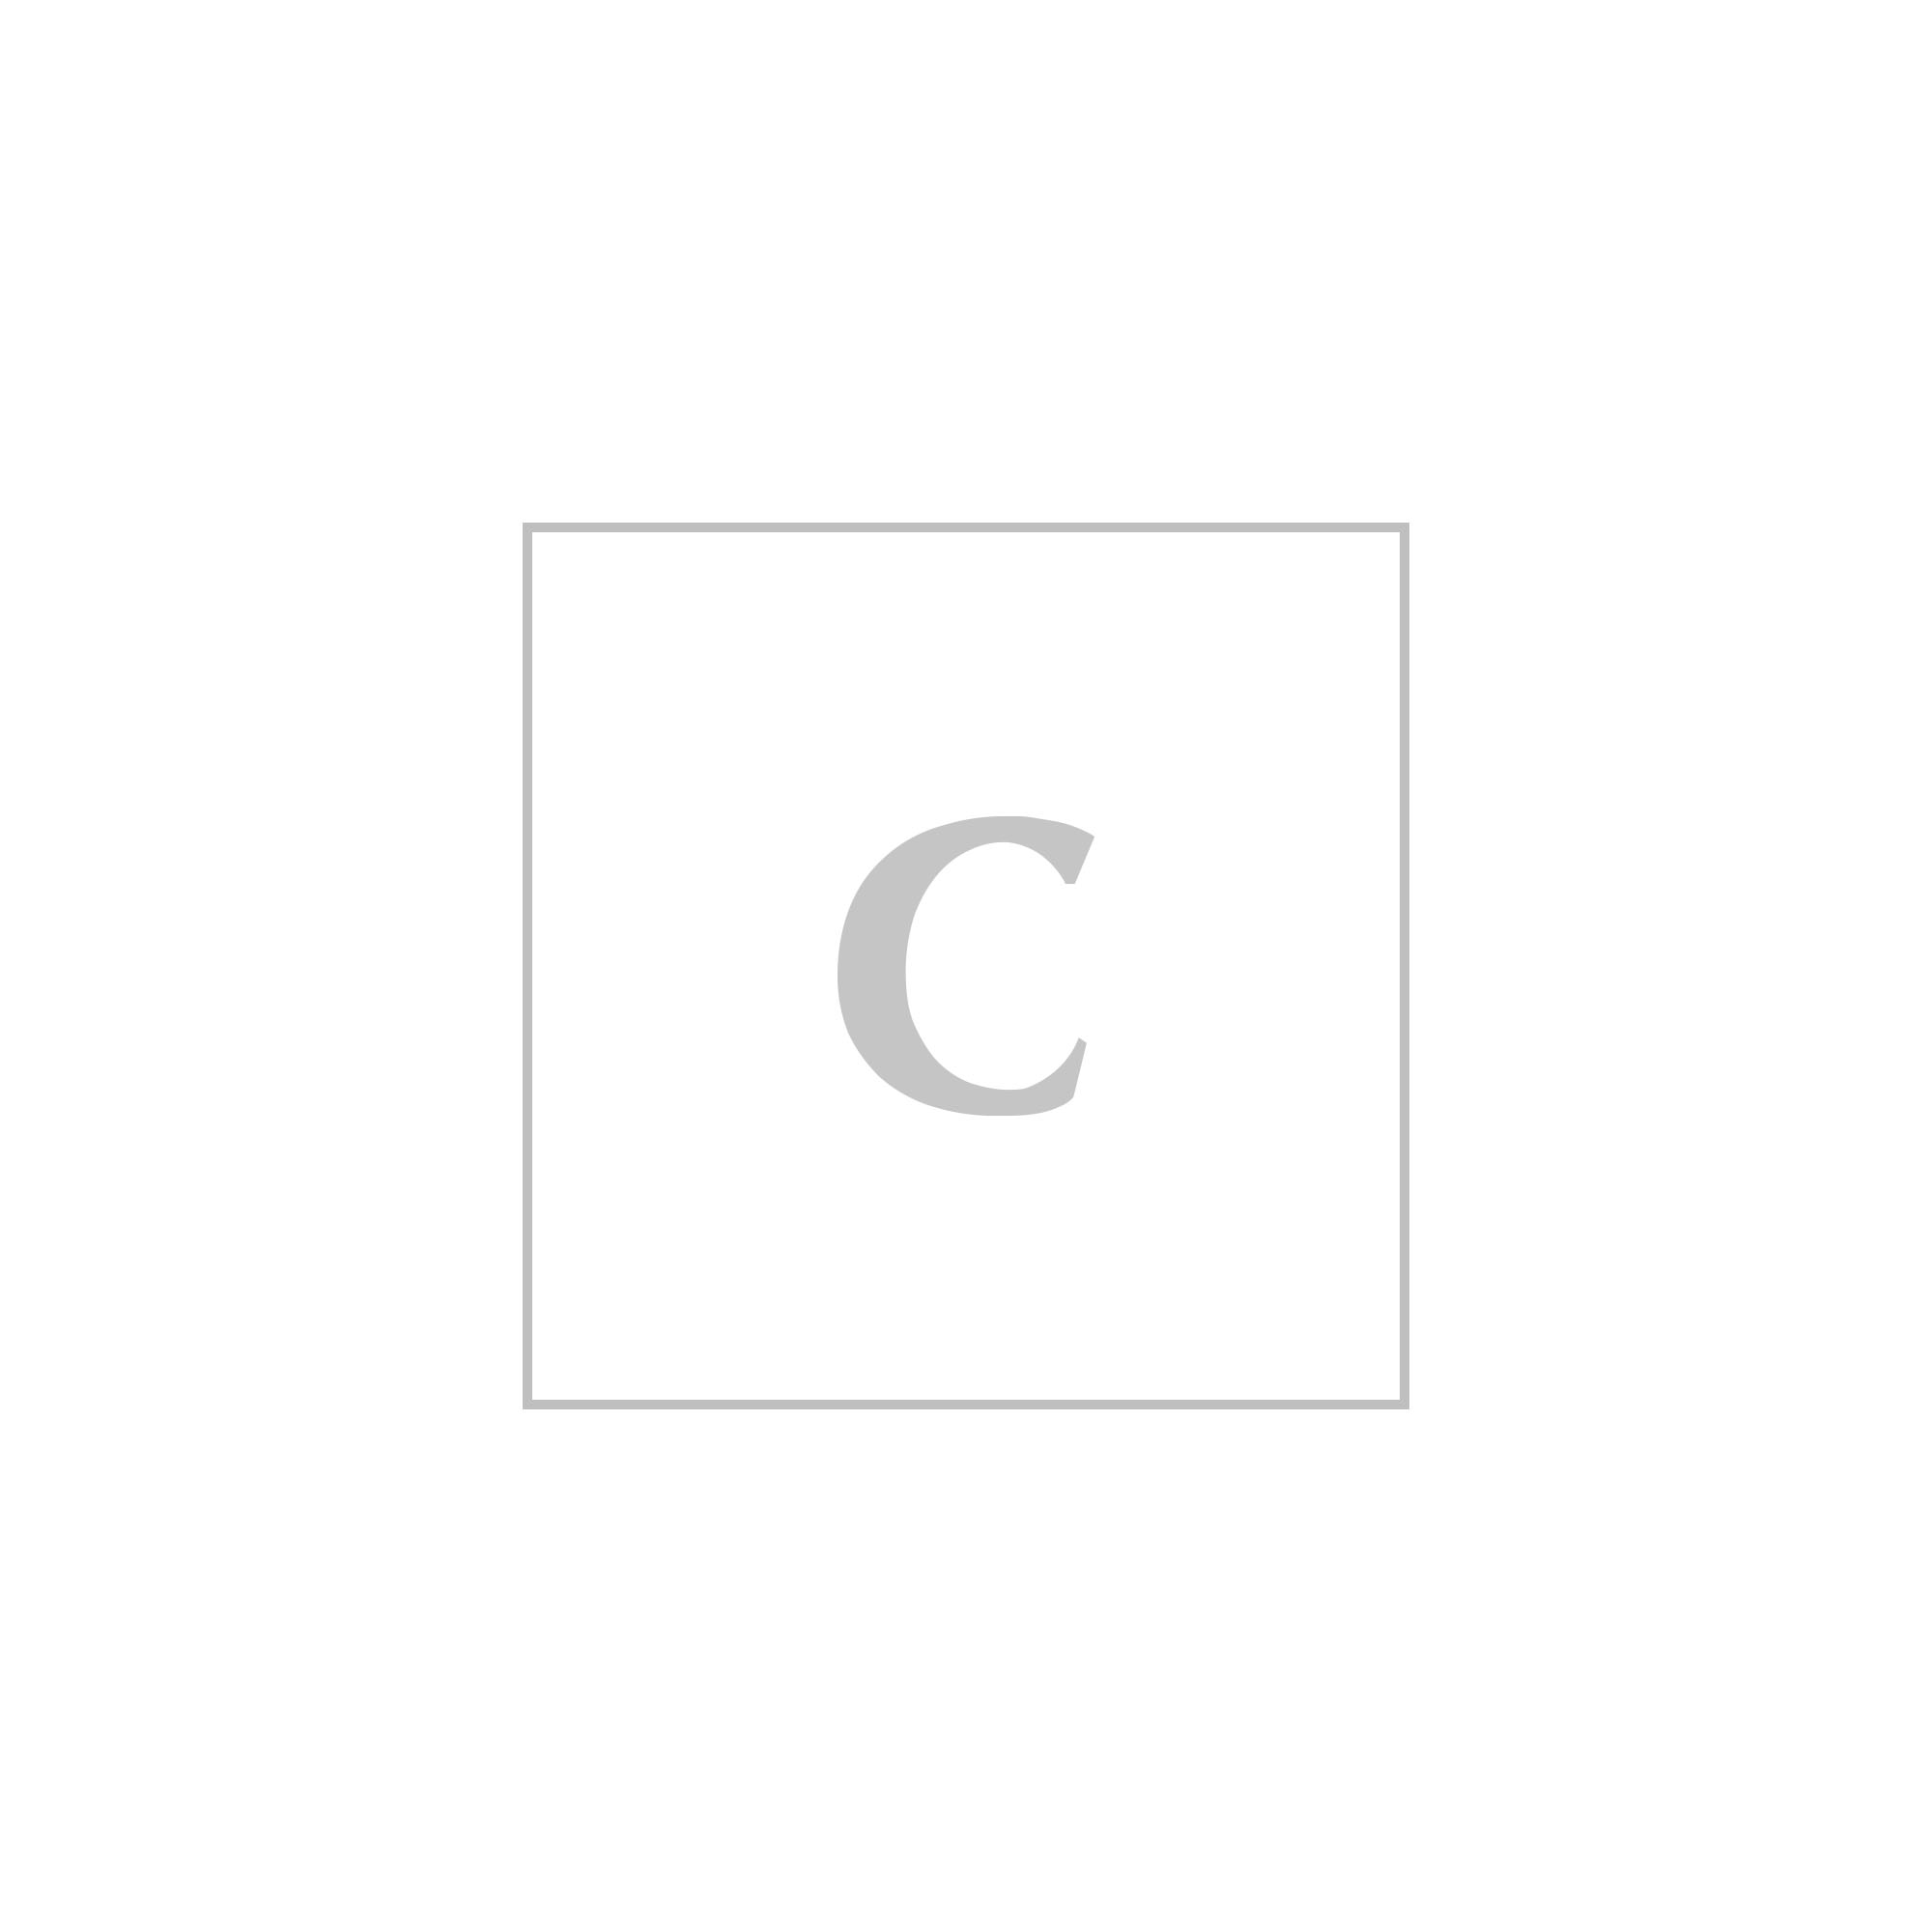 Dolce & gabbana dauphine print riga 5 logo belt